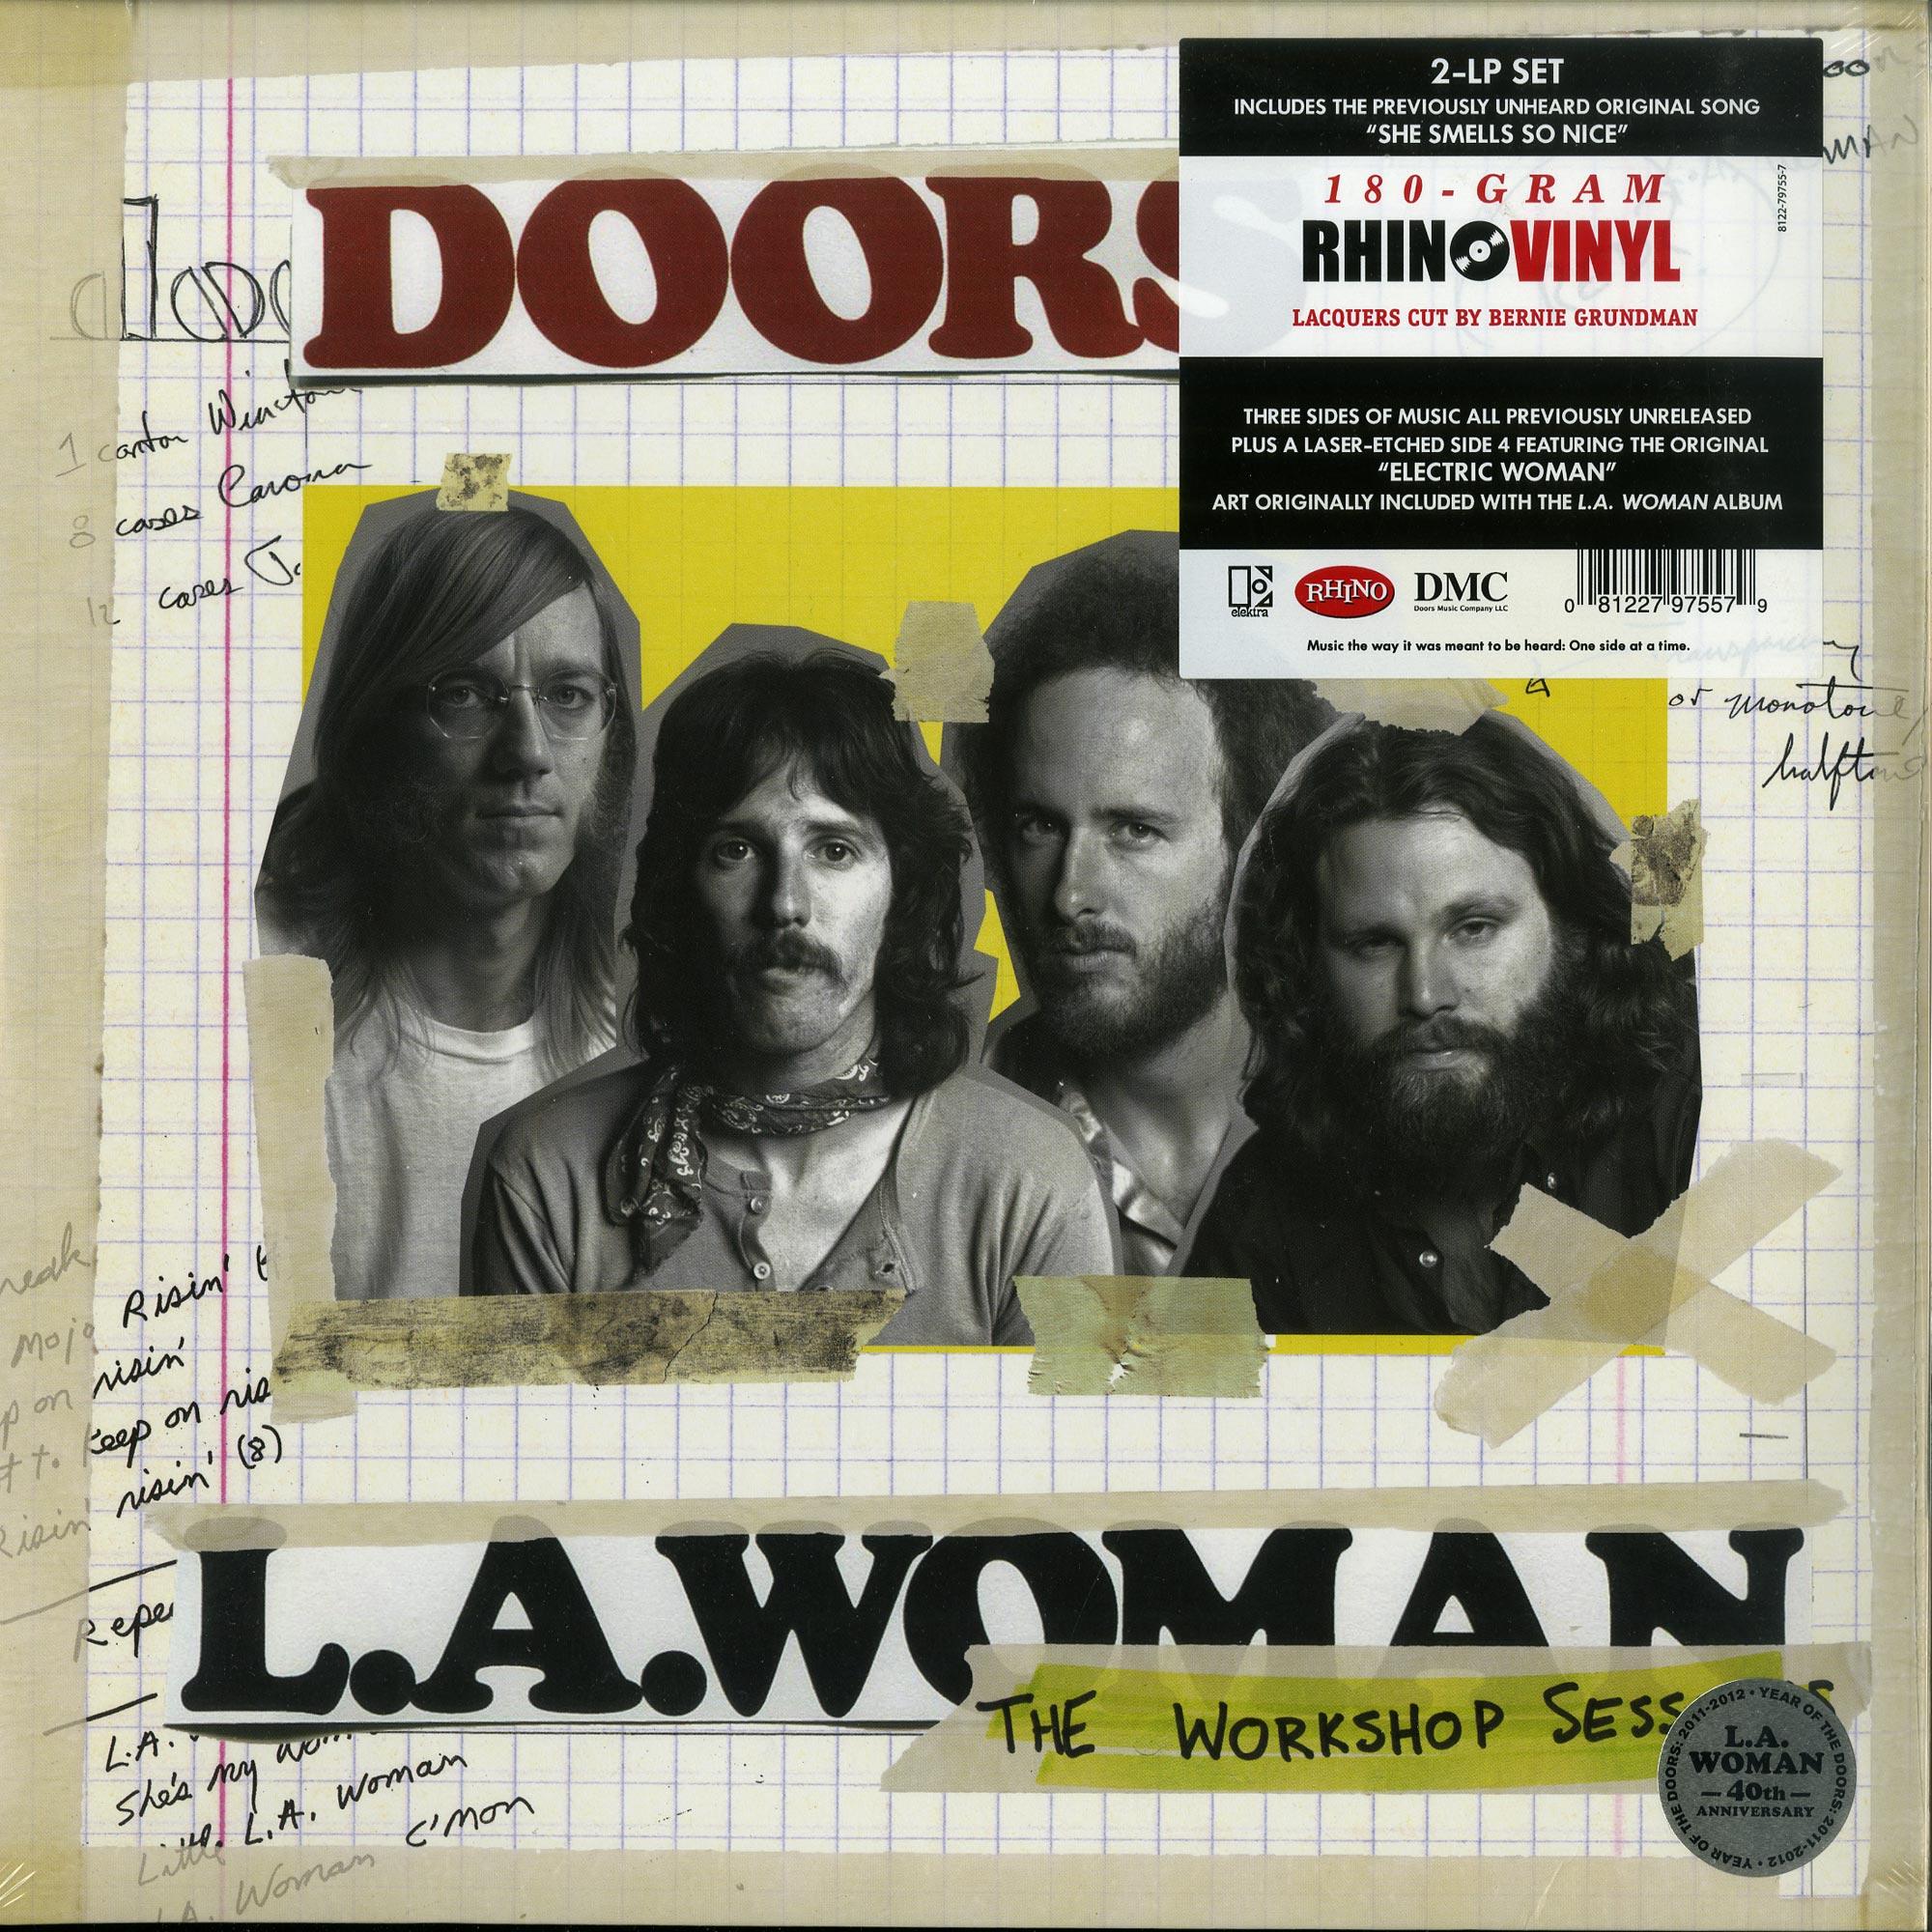 Doors - L A  WOMAN - THE WORKSHOP SESSIONS